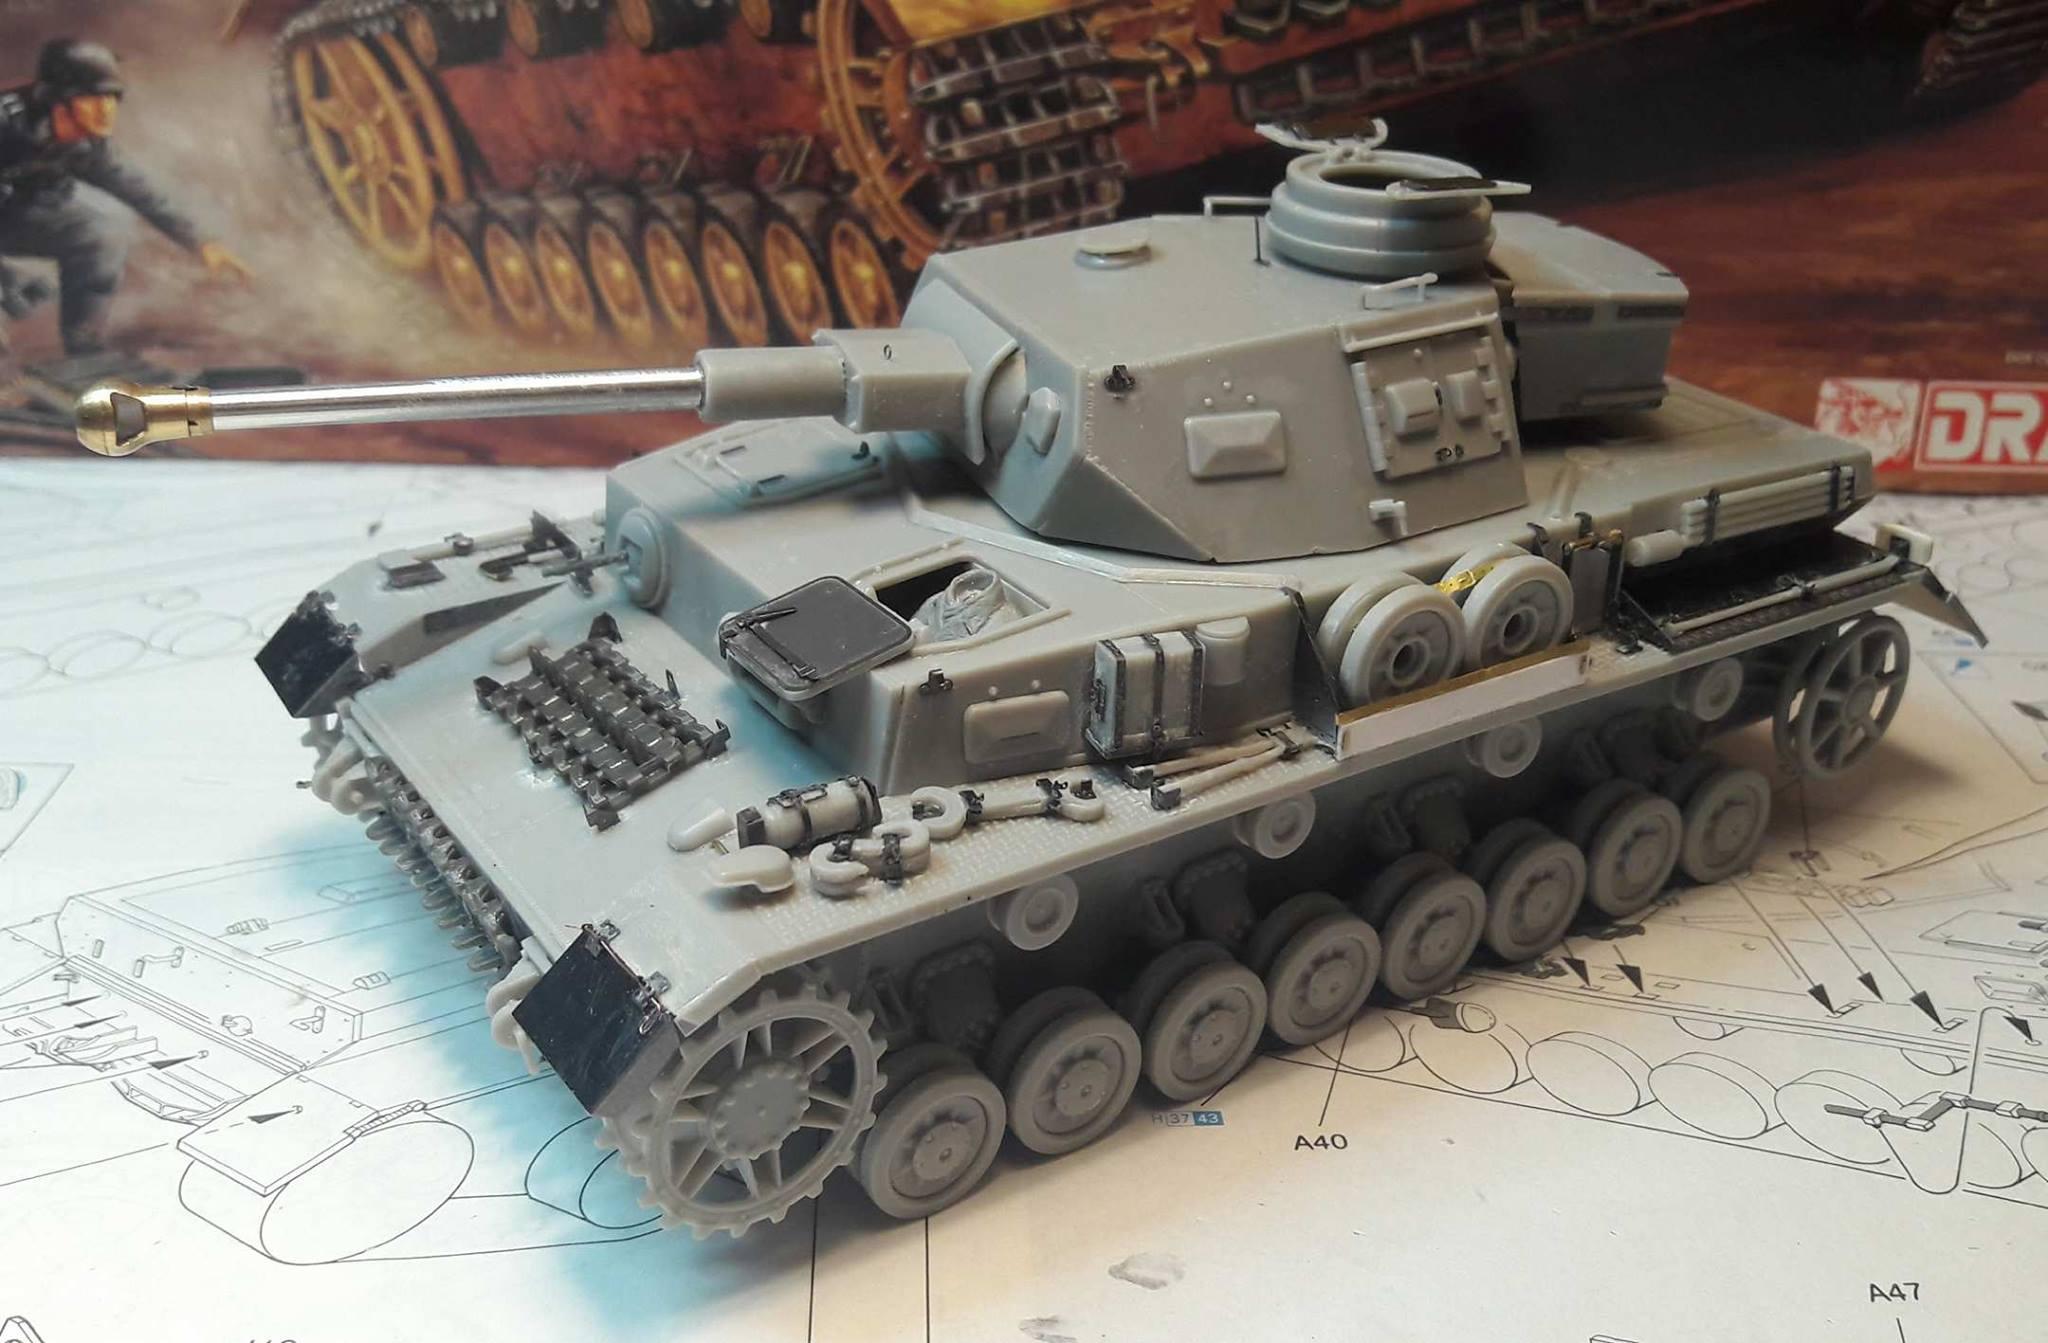 PzKpfw. IV Ausf. F2 - Dragon - Page 2 9091642119100610212191410034995399200348o